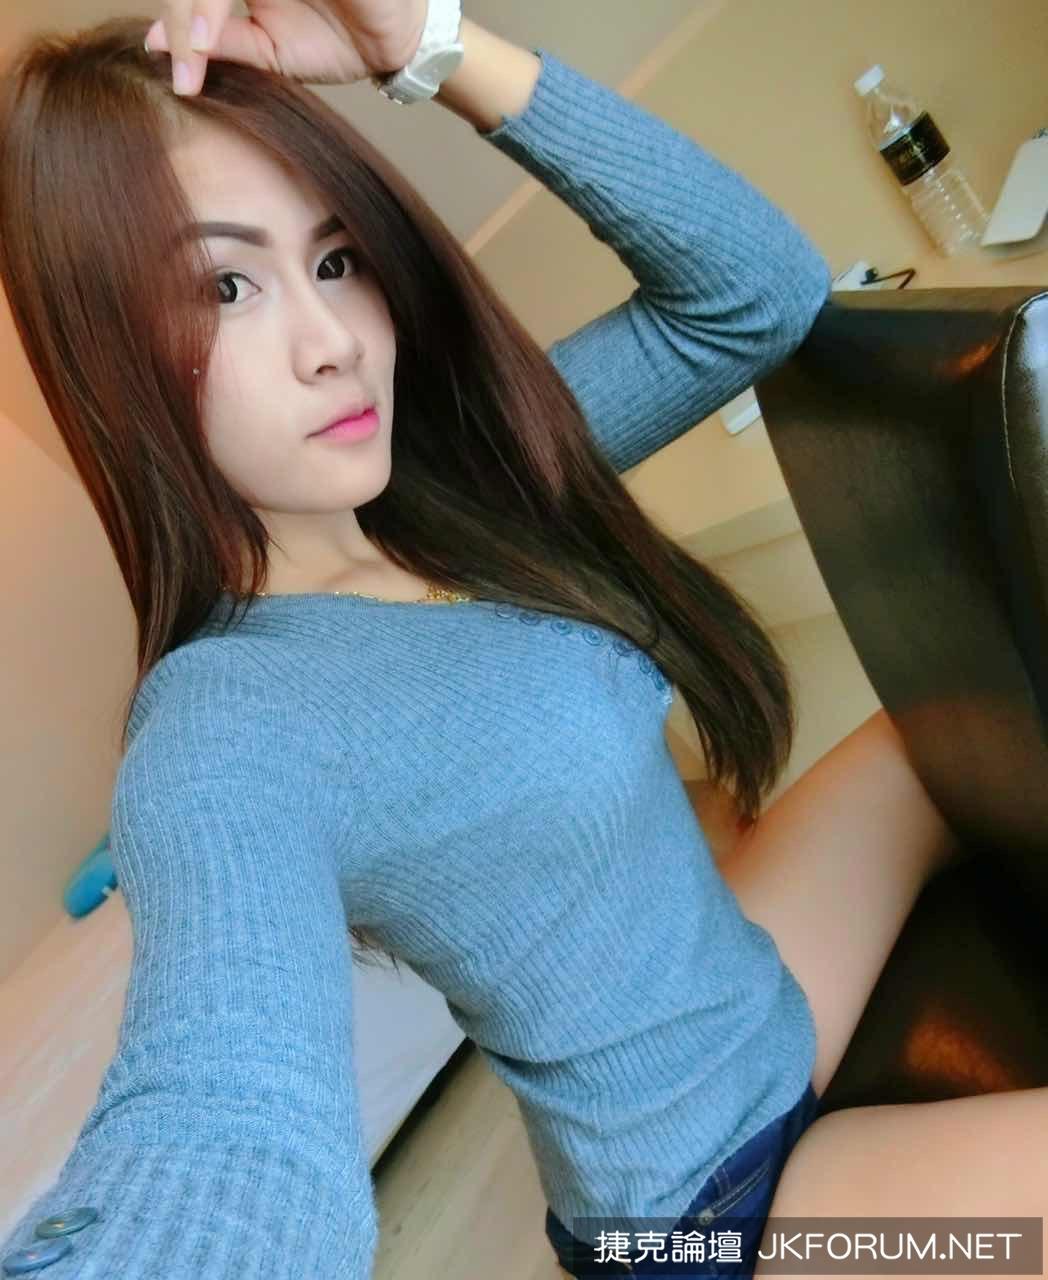 S__4923481.jpg